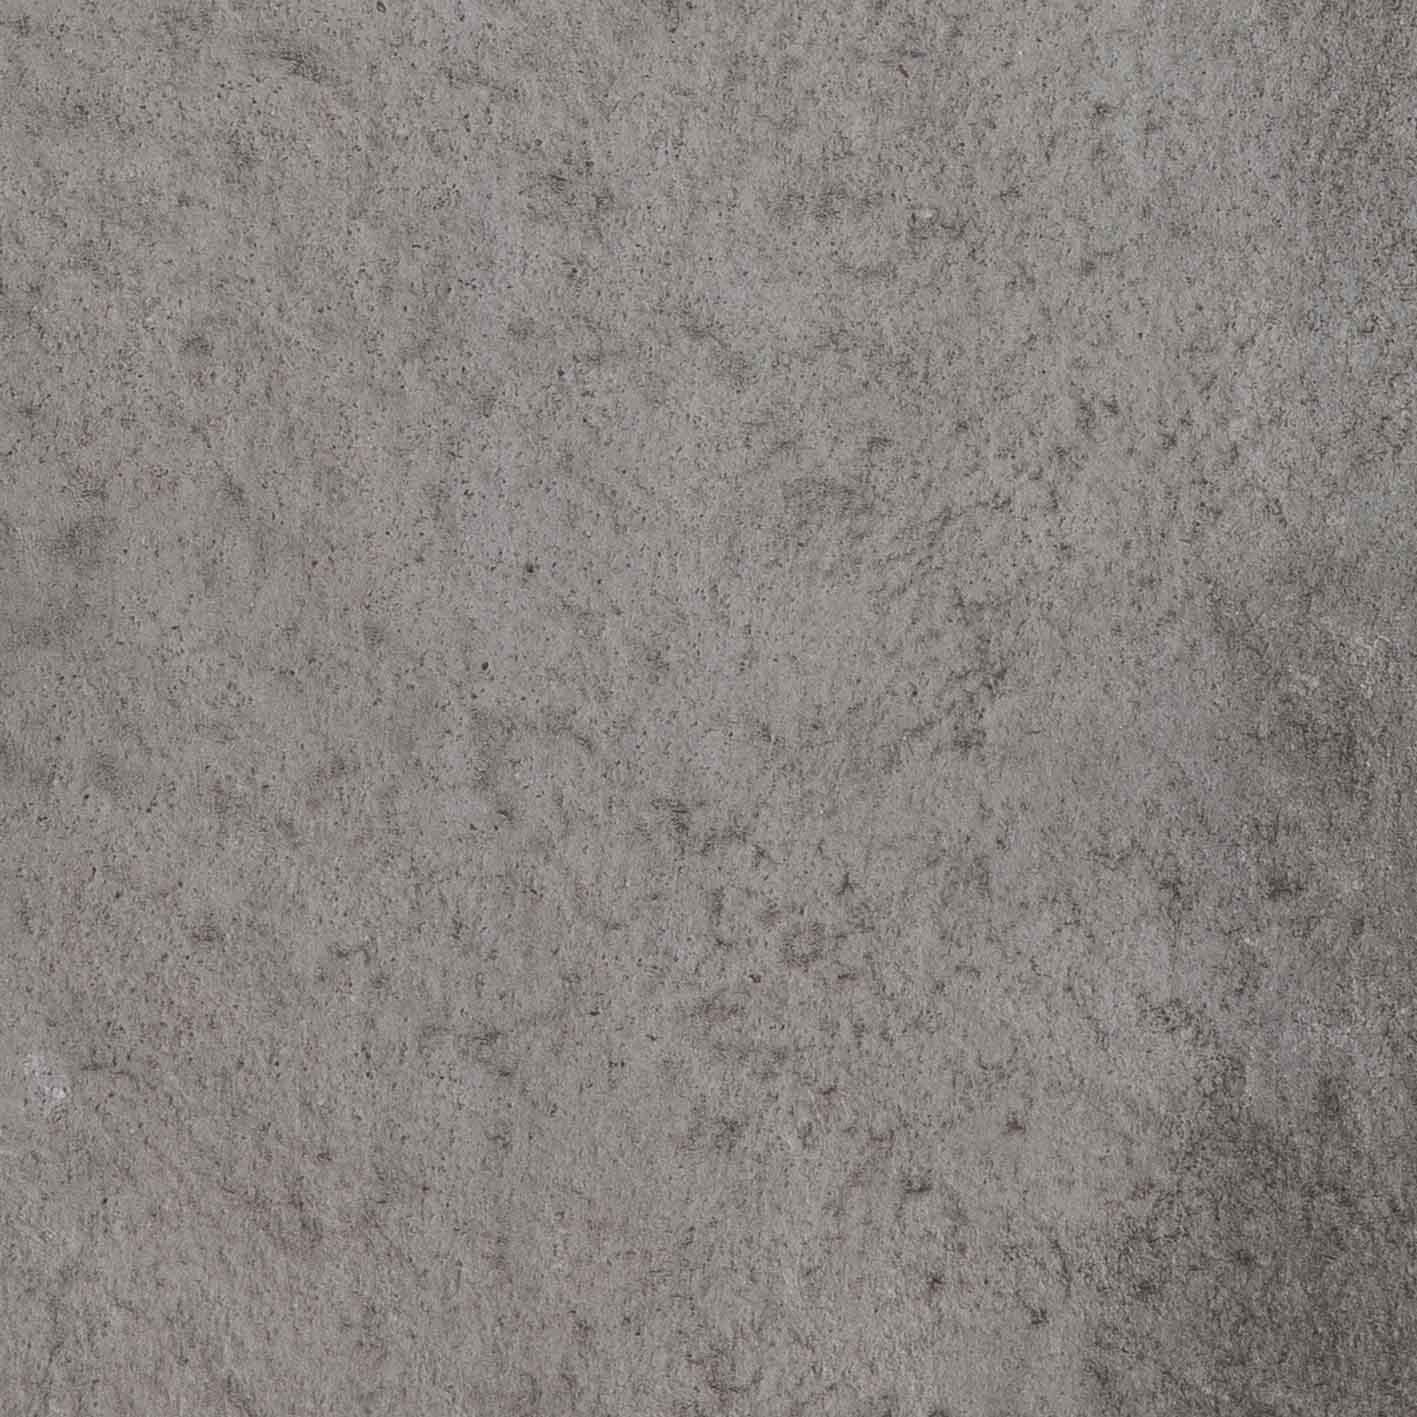 Argille 2.0 Terra Grigia Slate-hammered 20mm 60 x 60